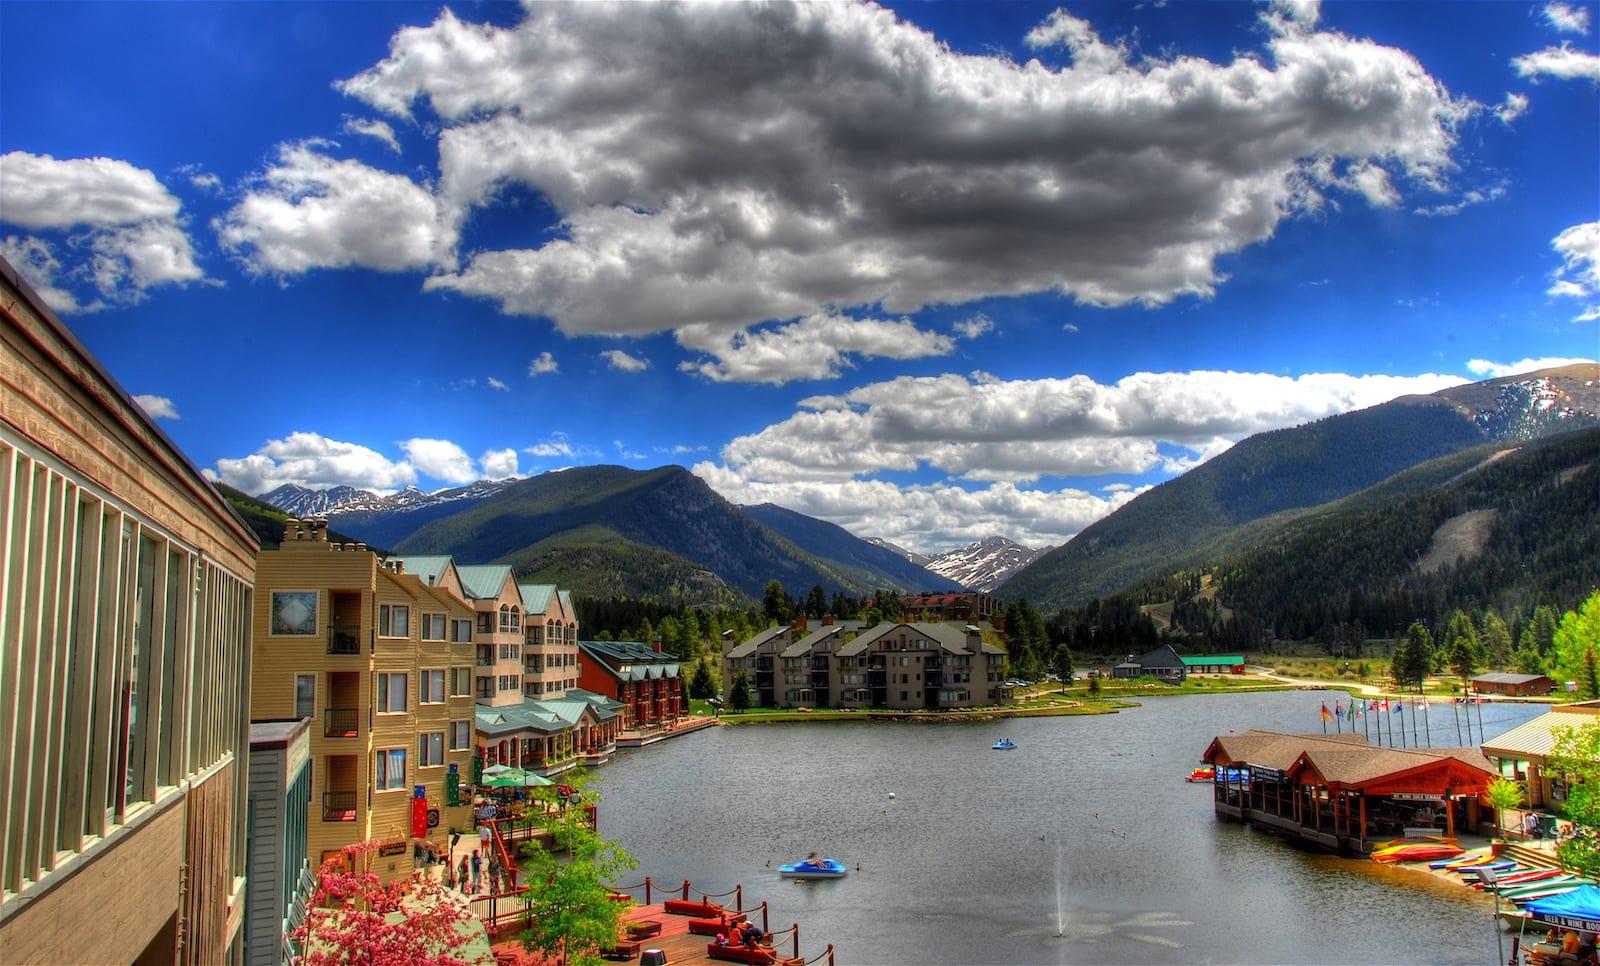 Keystone Lodge, Colorado.